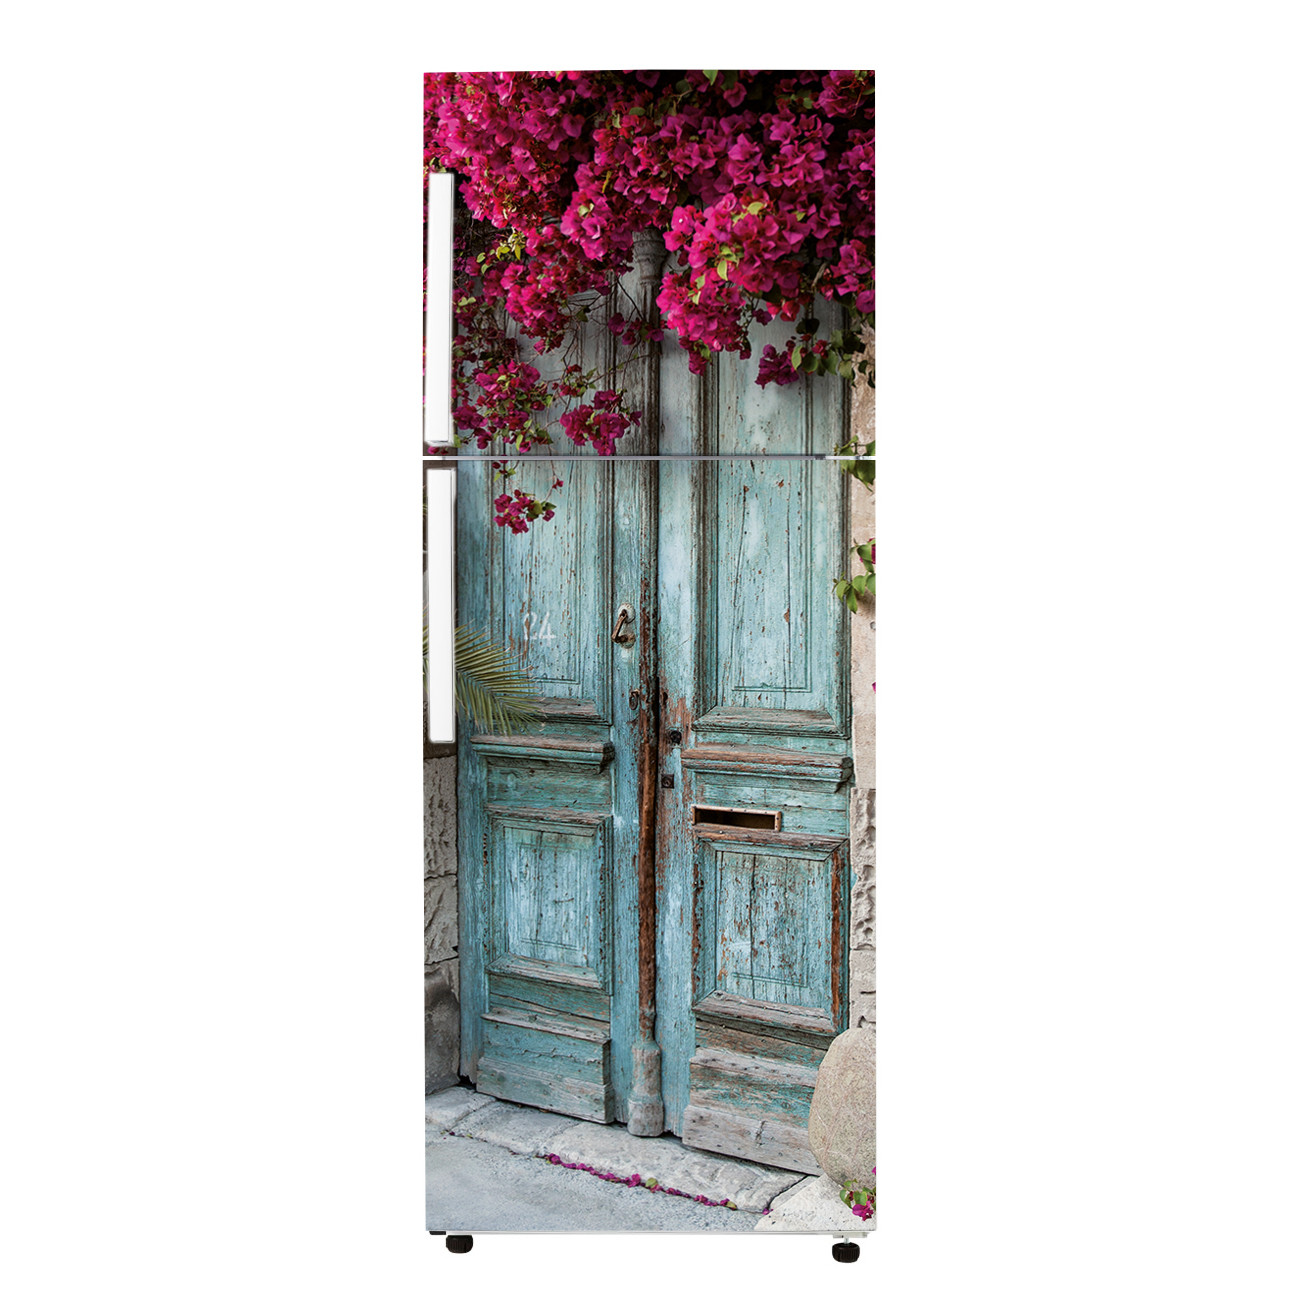 stickers frigo porte en bois 3 des prix 50 moins cher qu 39 en magasin. Black Bedroom Furniture Sets. Home Design Ideas